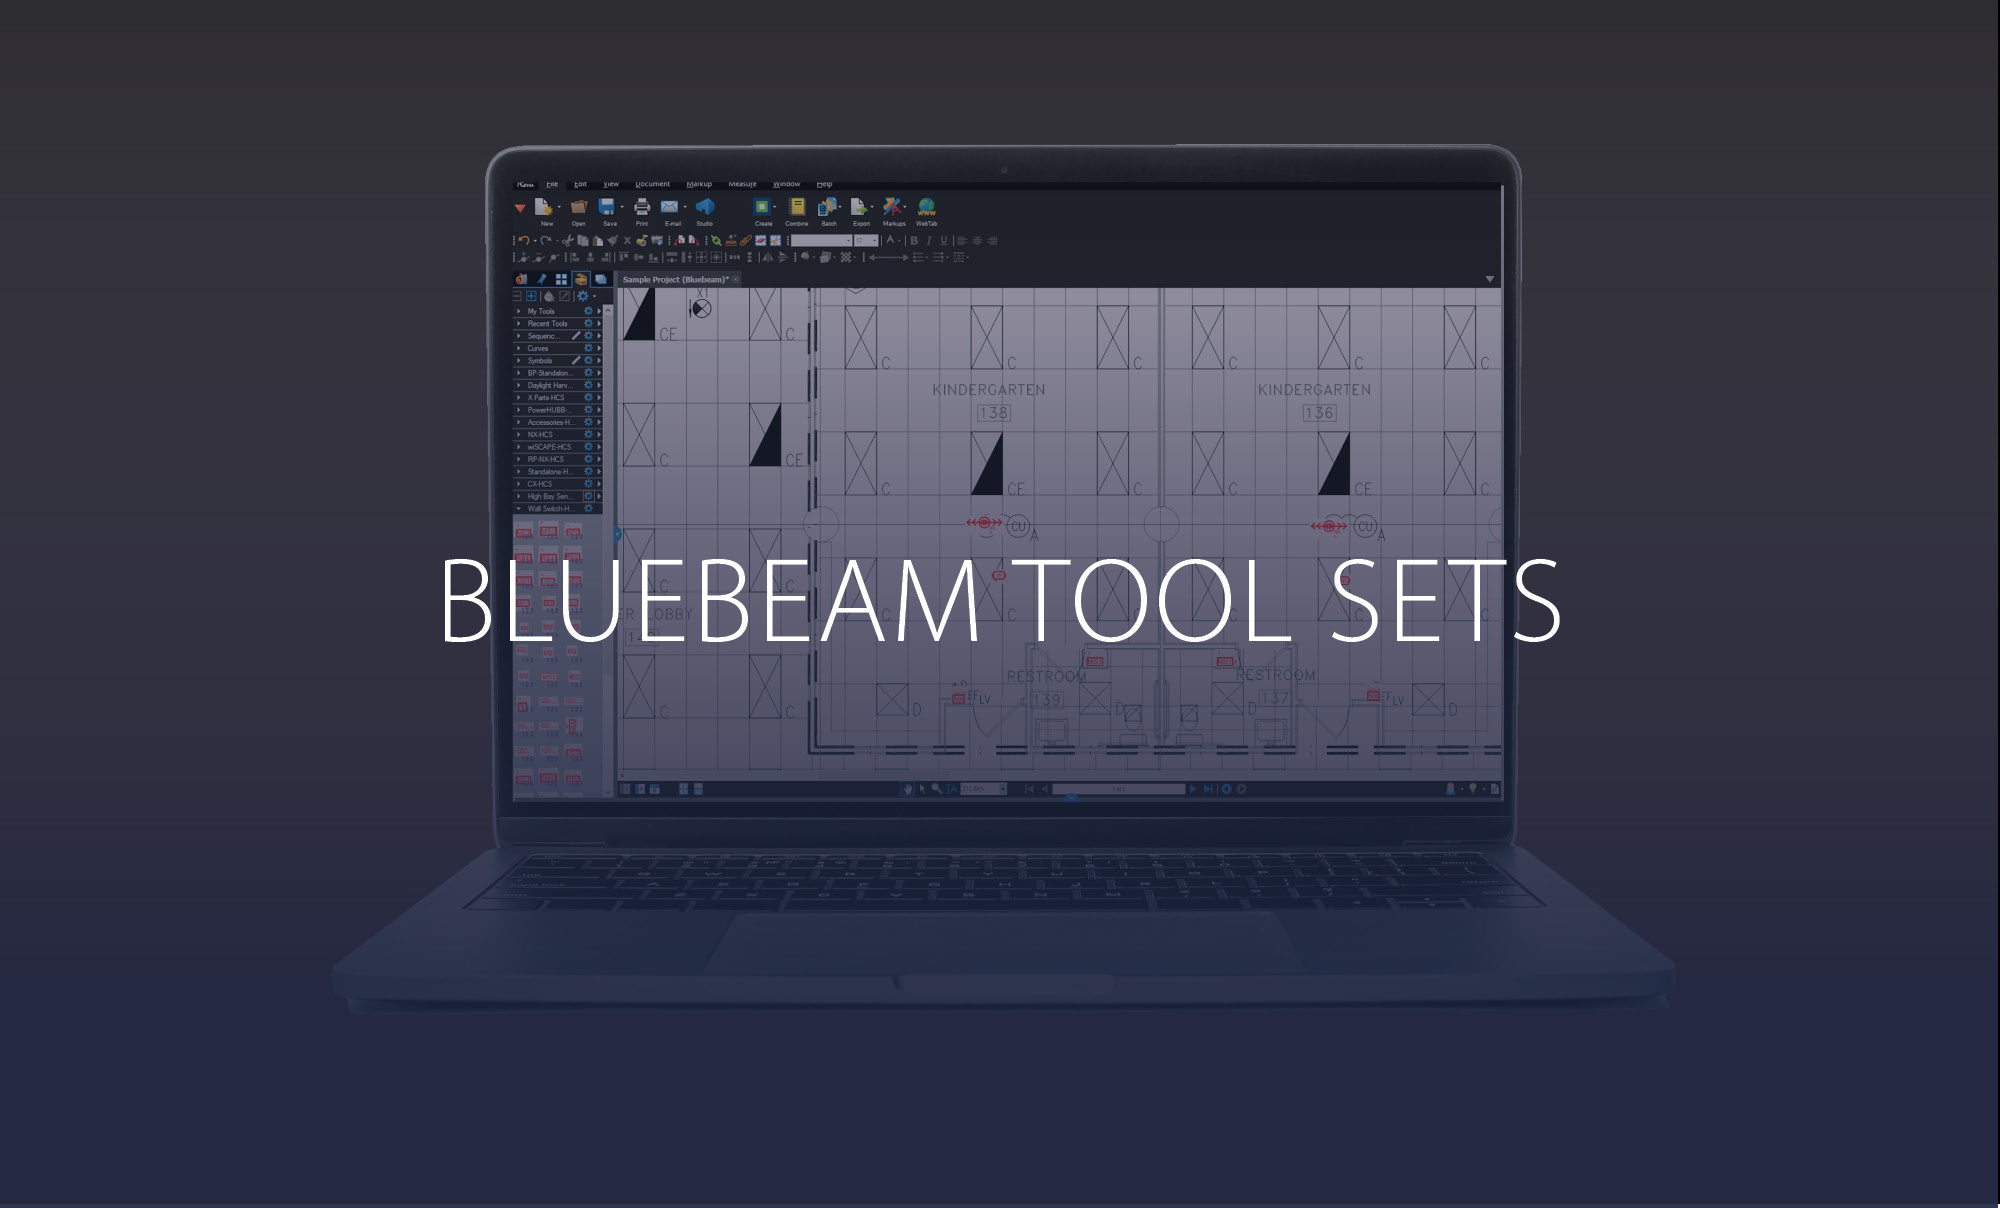 Bluebeam Tool Sets